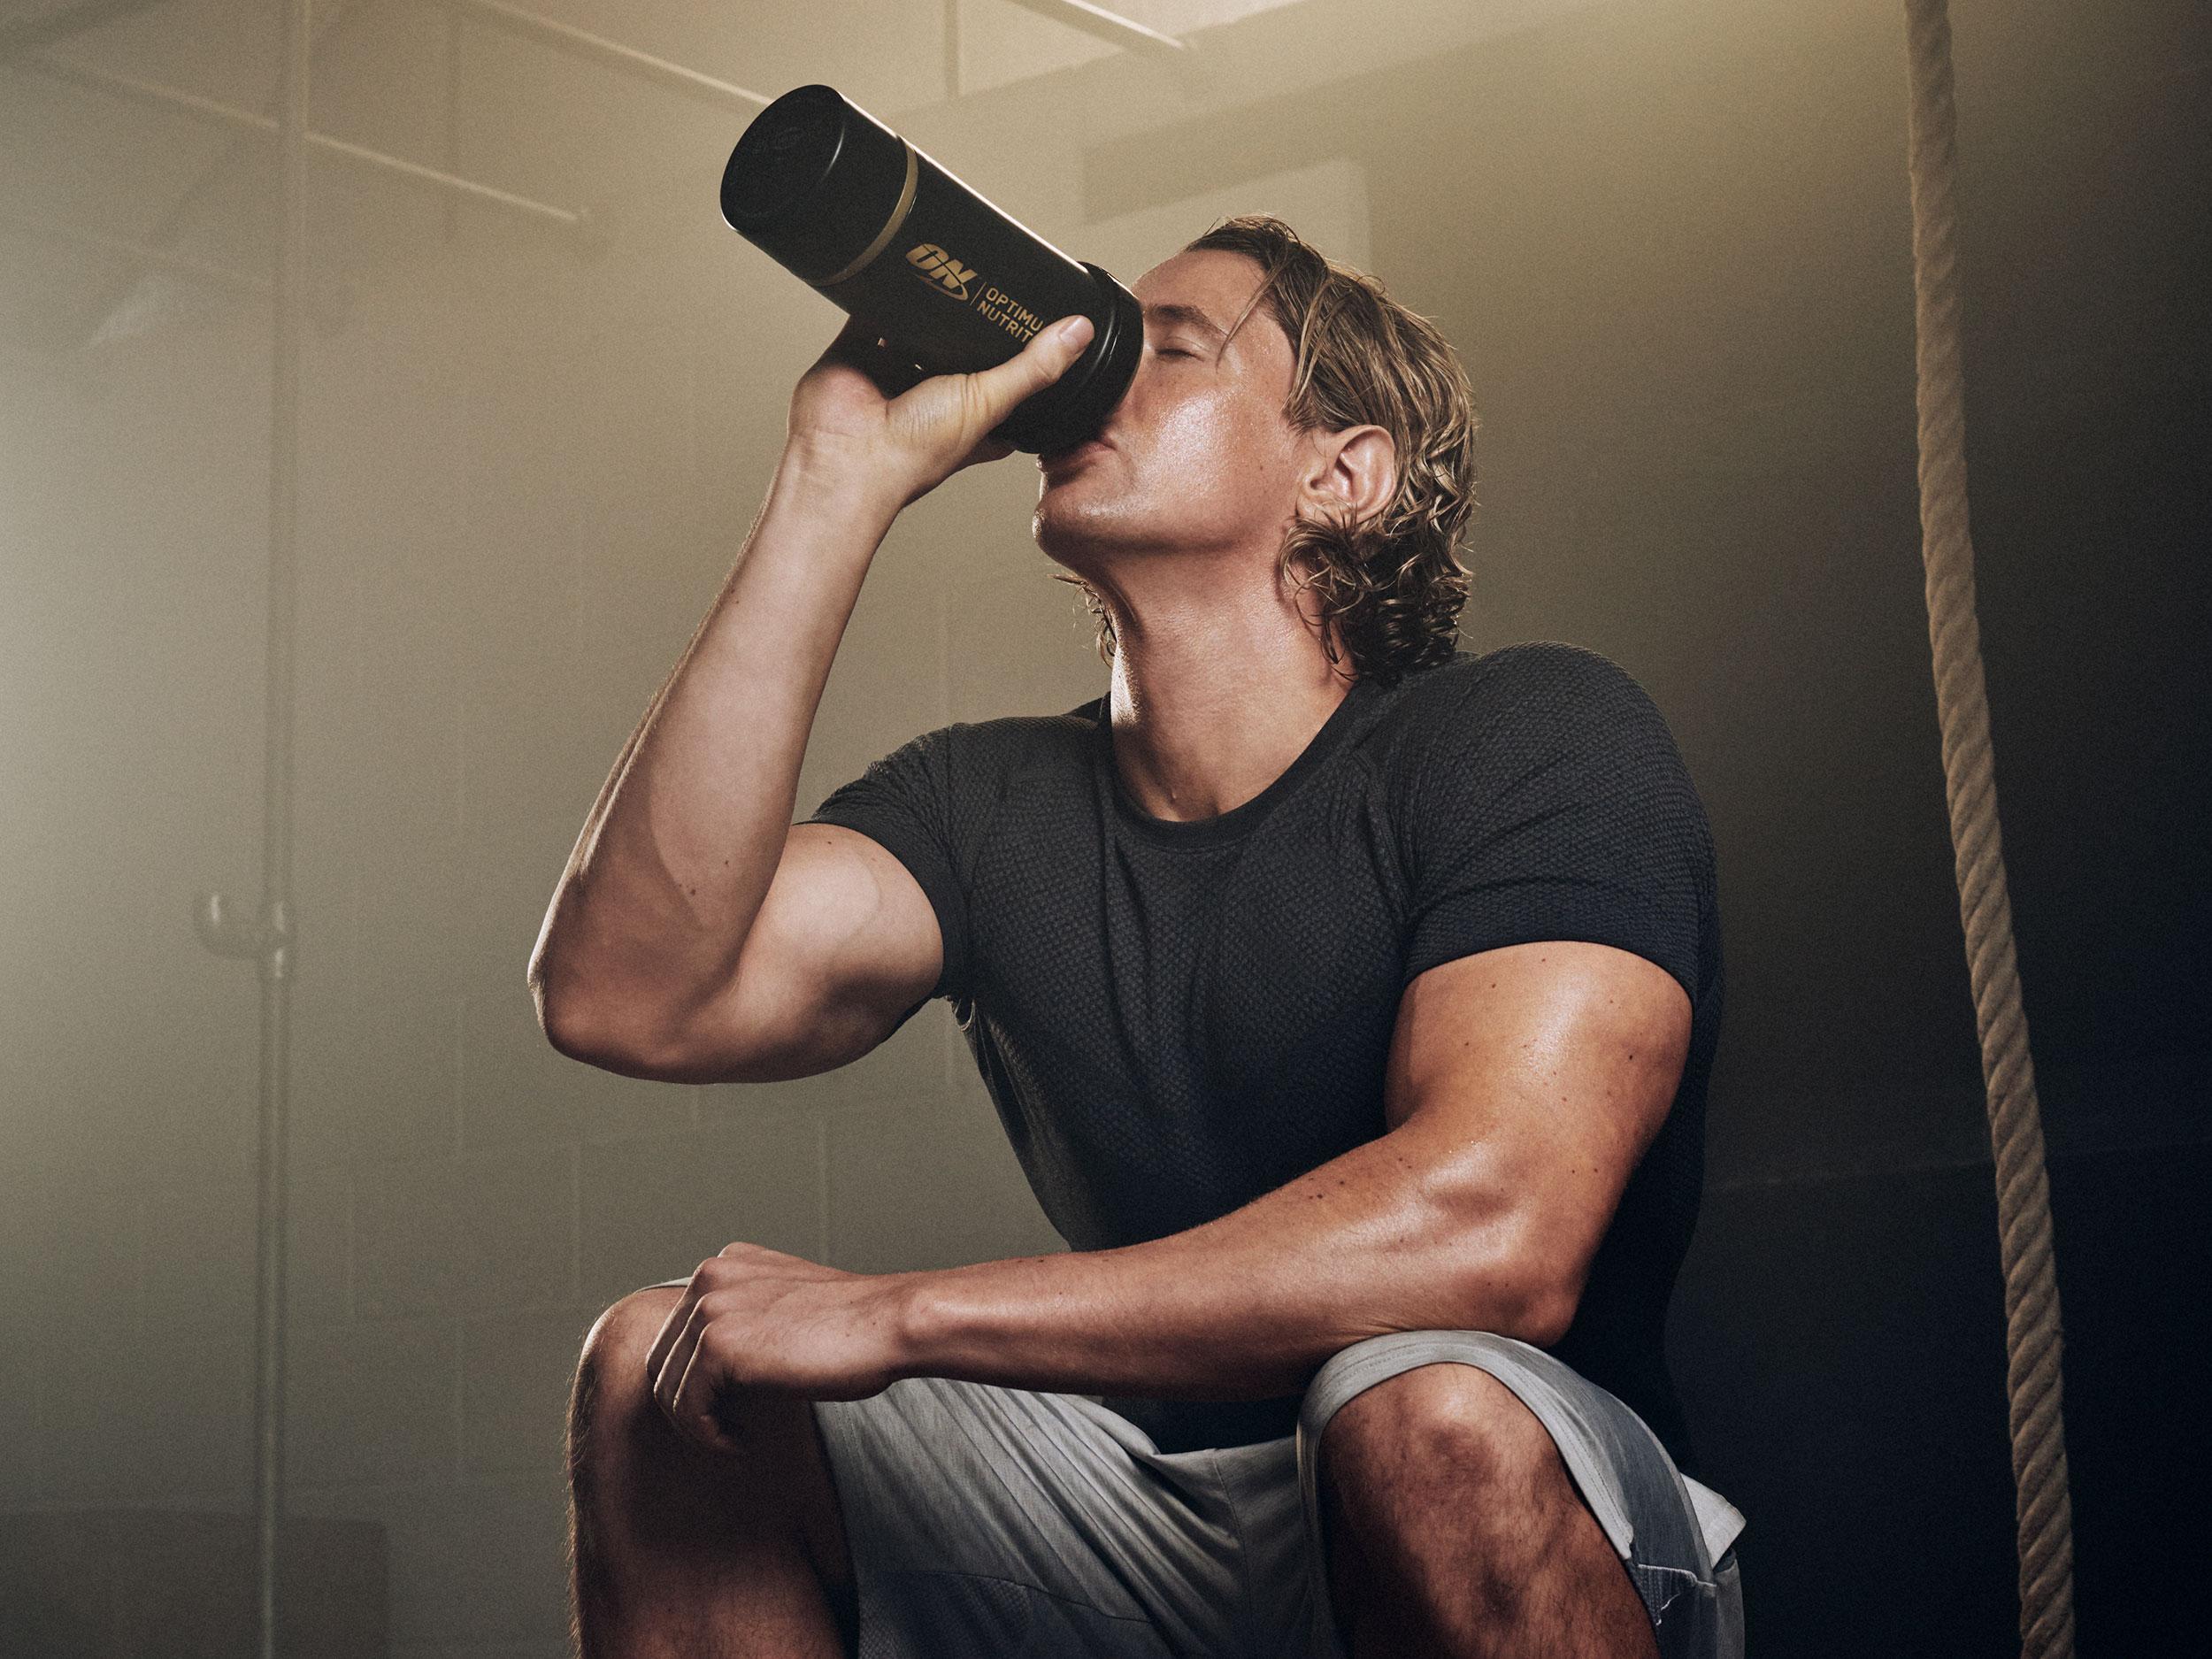 Unstoppable_Shaun_Drinking_4x3.jpg